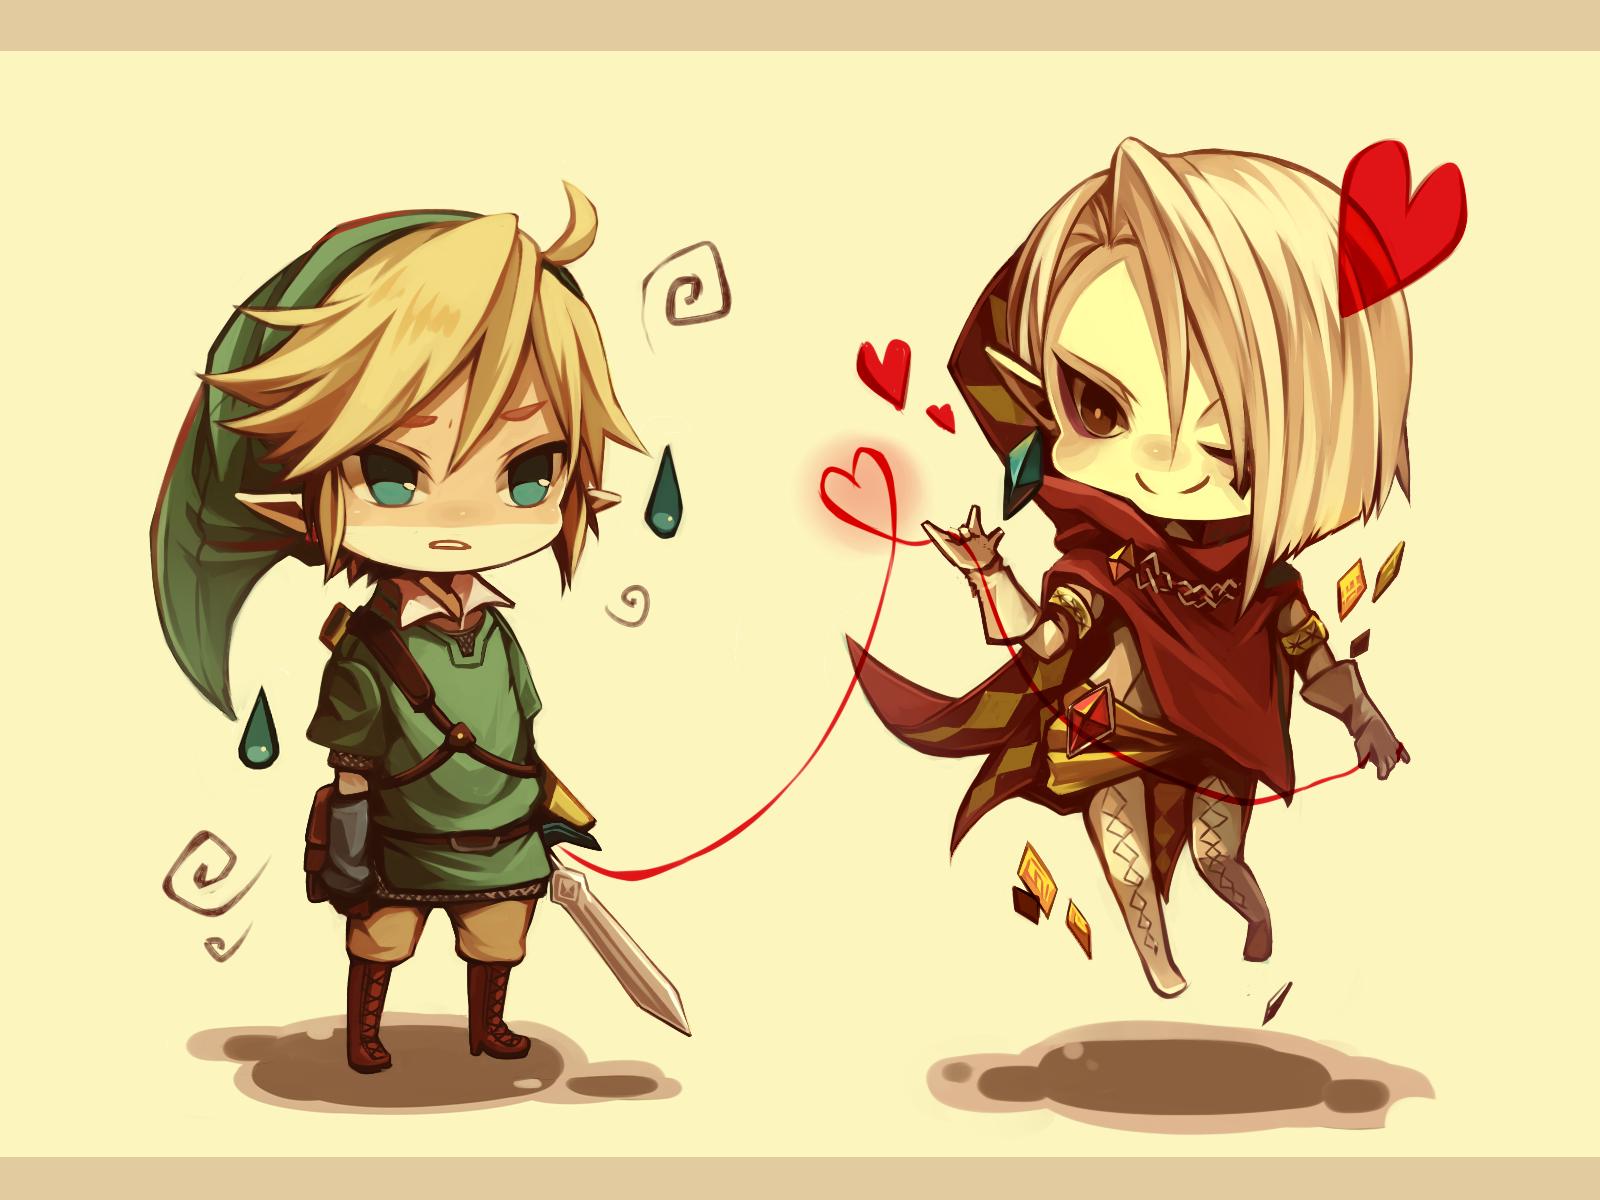 Chibis Link and Ghirahim <3 | #Skyward_Sword